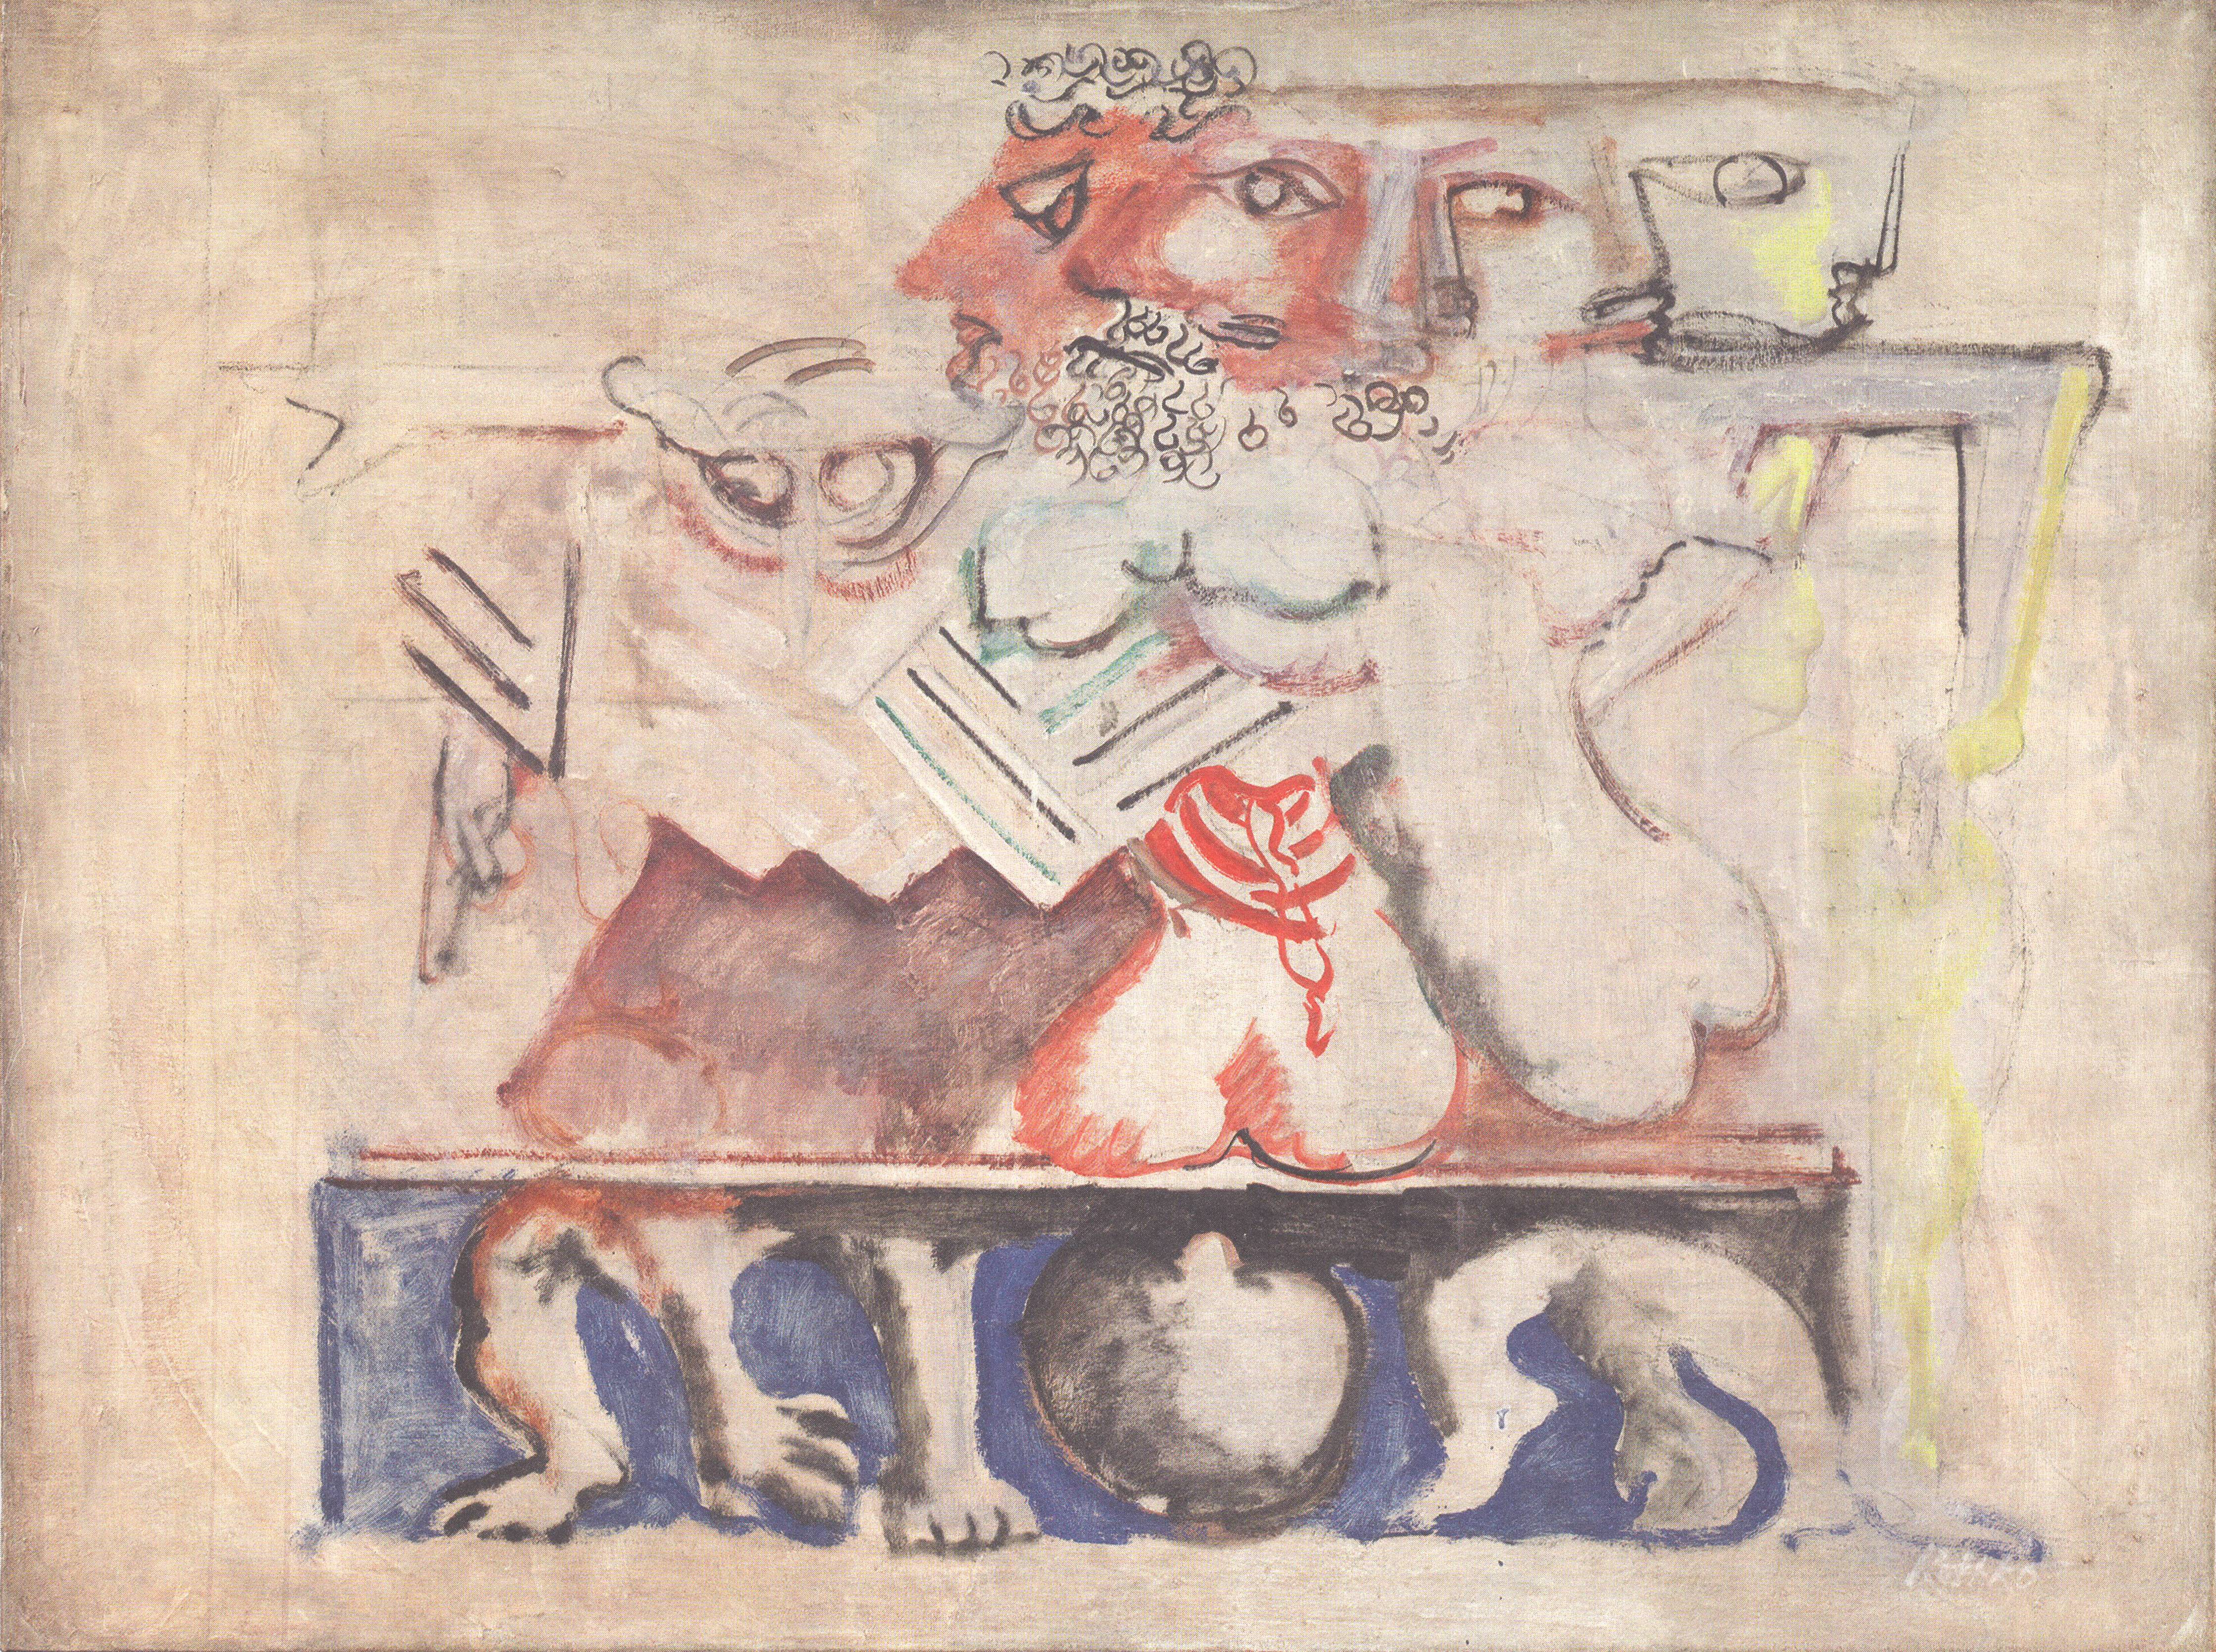 Mark-Rothko-Antigone-1941.-Oil-paint-and-charcoal-on-canvas-86-x-116-cm